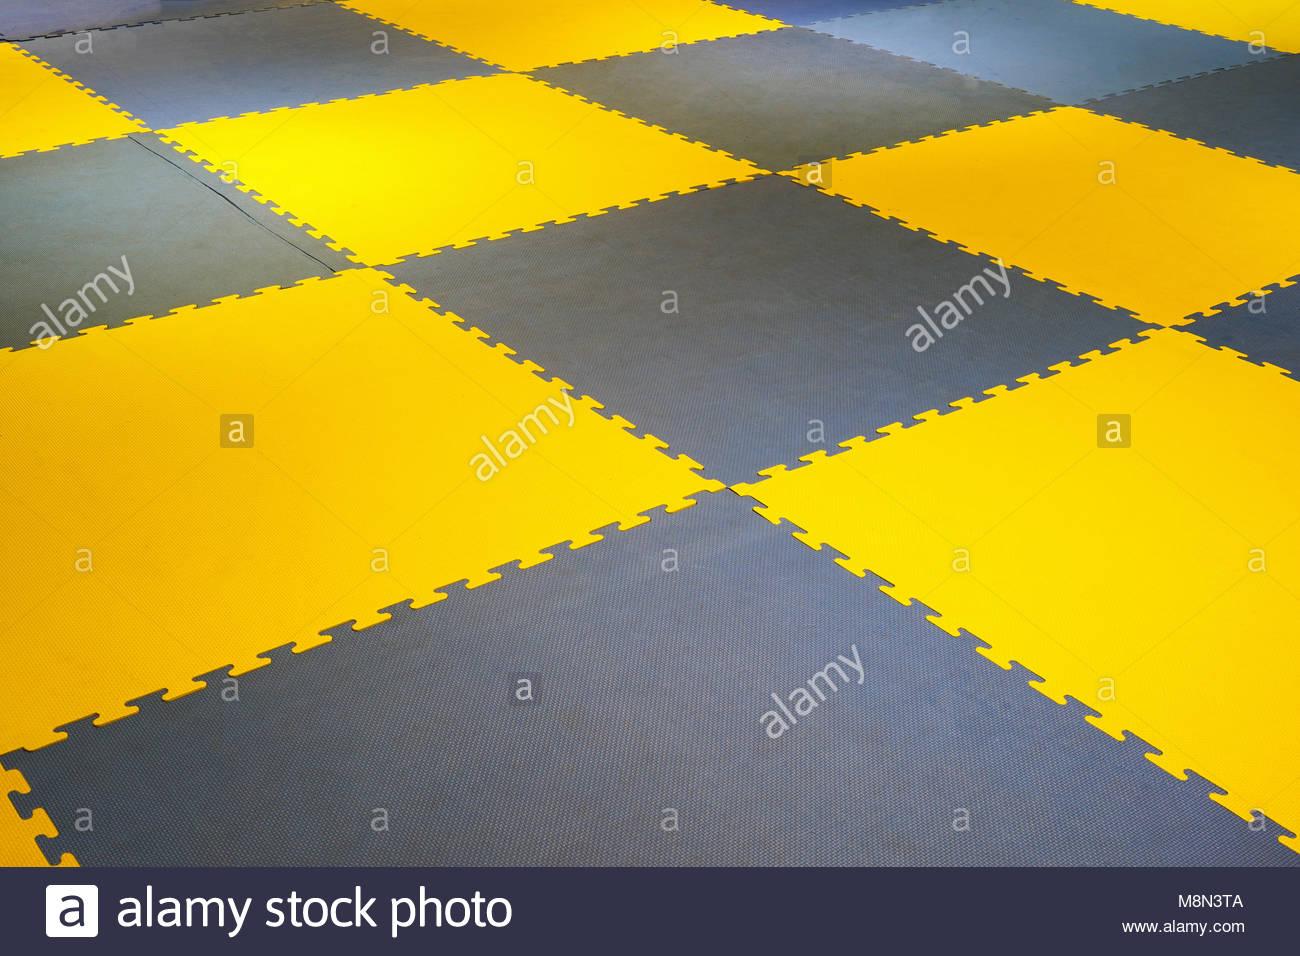 Flooring tiles stock photos flooring tiles stock images alamy ground futsal futsal plastic court flooring tiles texture floor stock image dailygadgetfo Choice Image